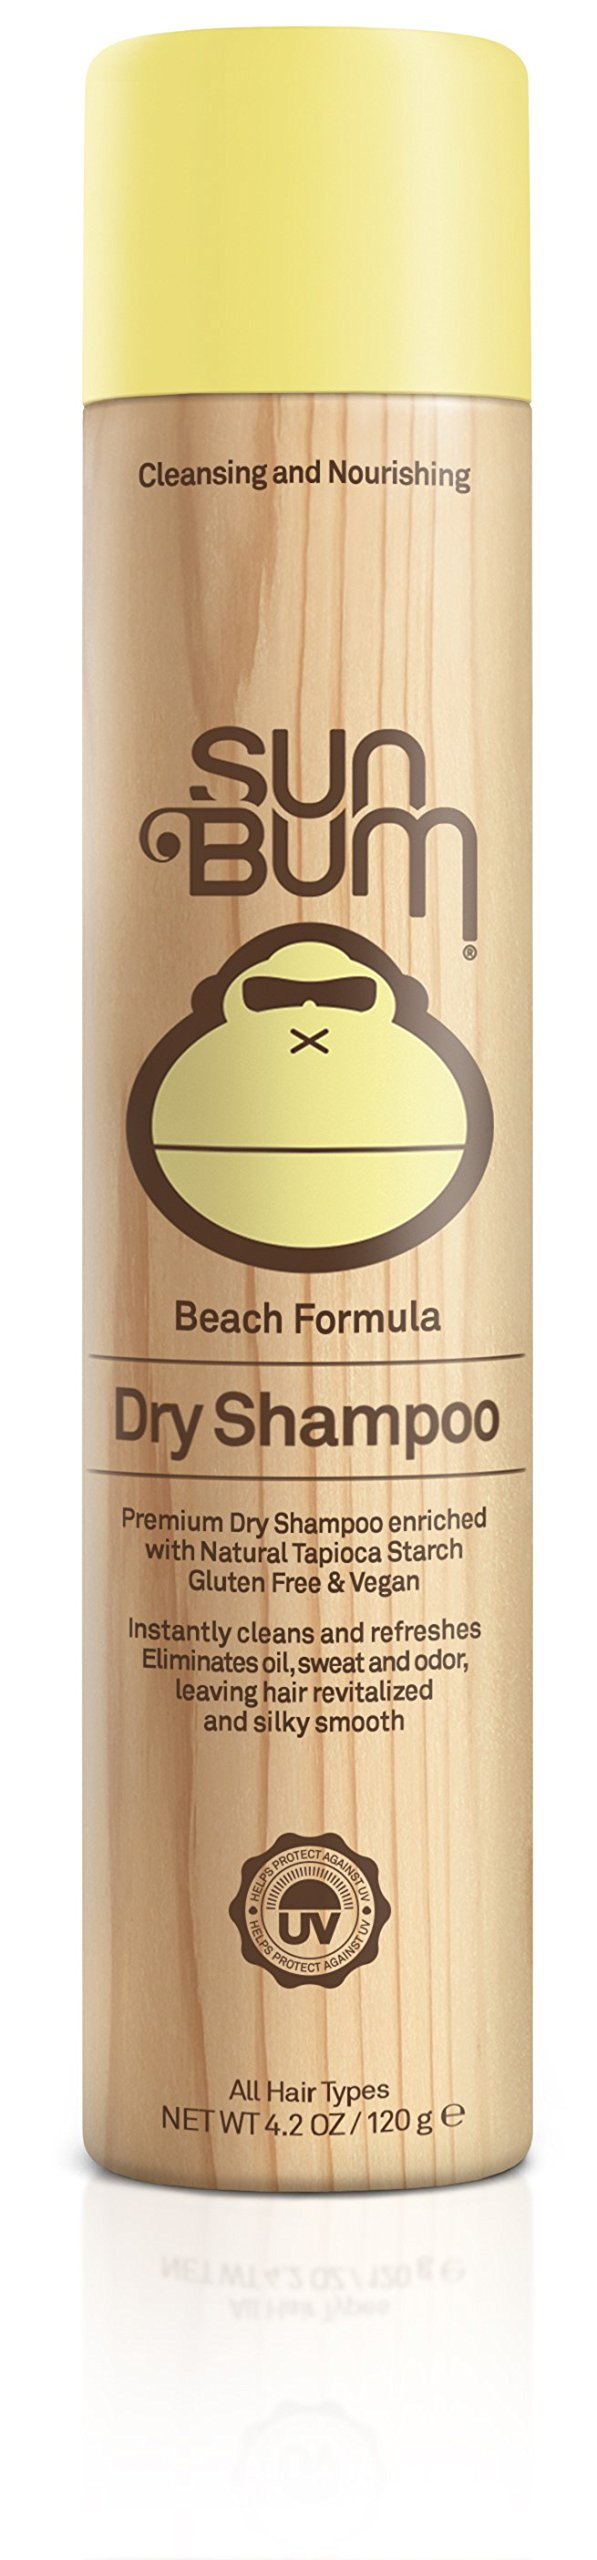 Sun Bum Beach Formula Revitalizing Dry Shampoo, 4.2 oz Bottle, 1 Count, Hair Refresher, Texturing Spray, Paraben Free, Oil Free, Gluten Free, Vegan by Sun Bum